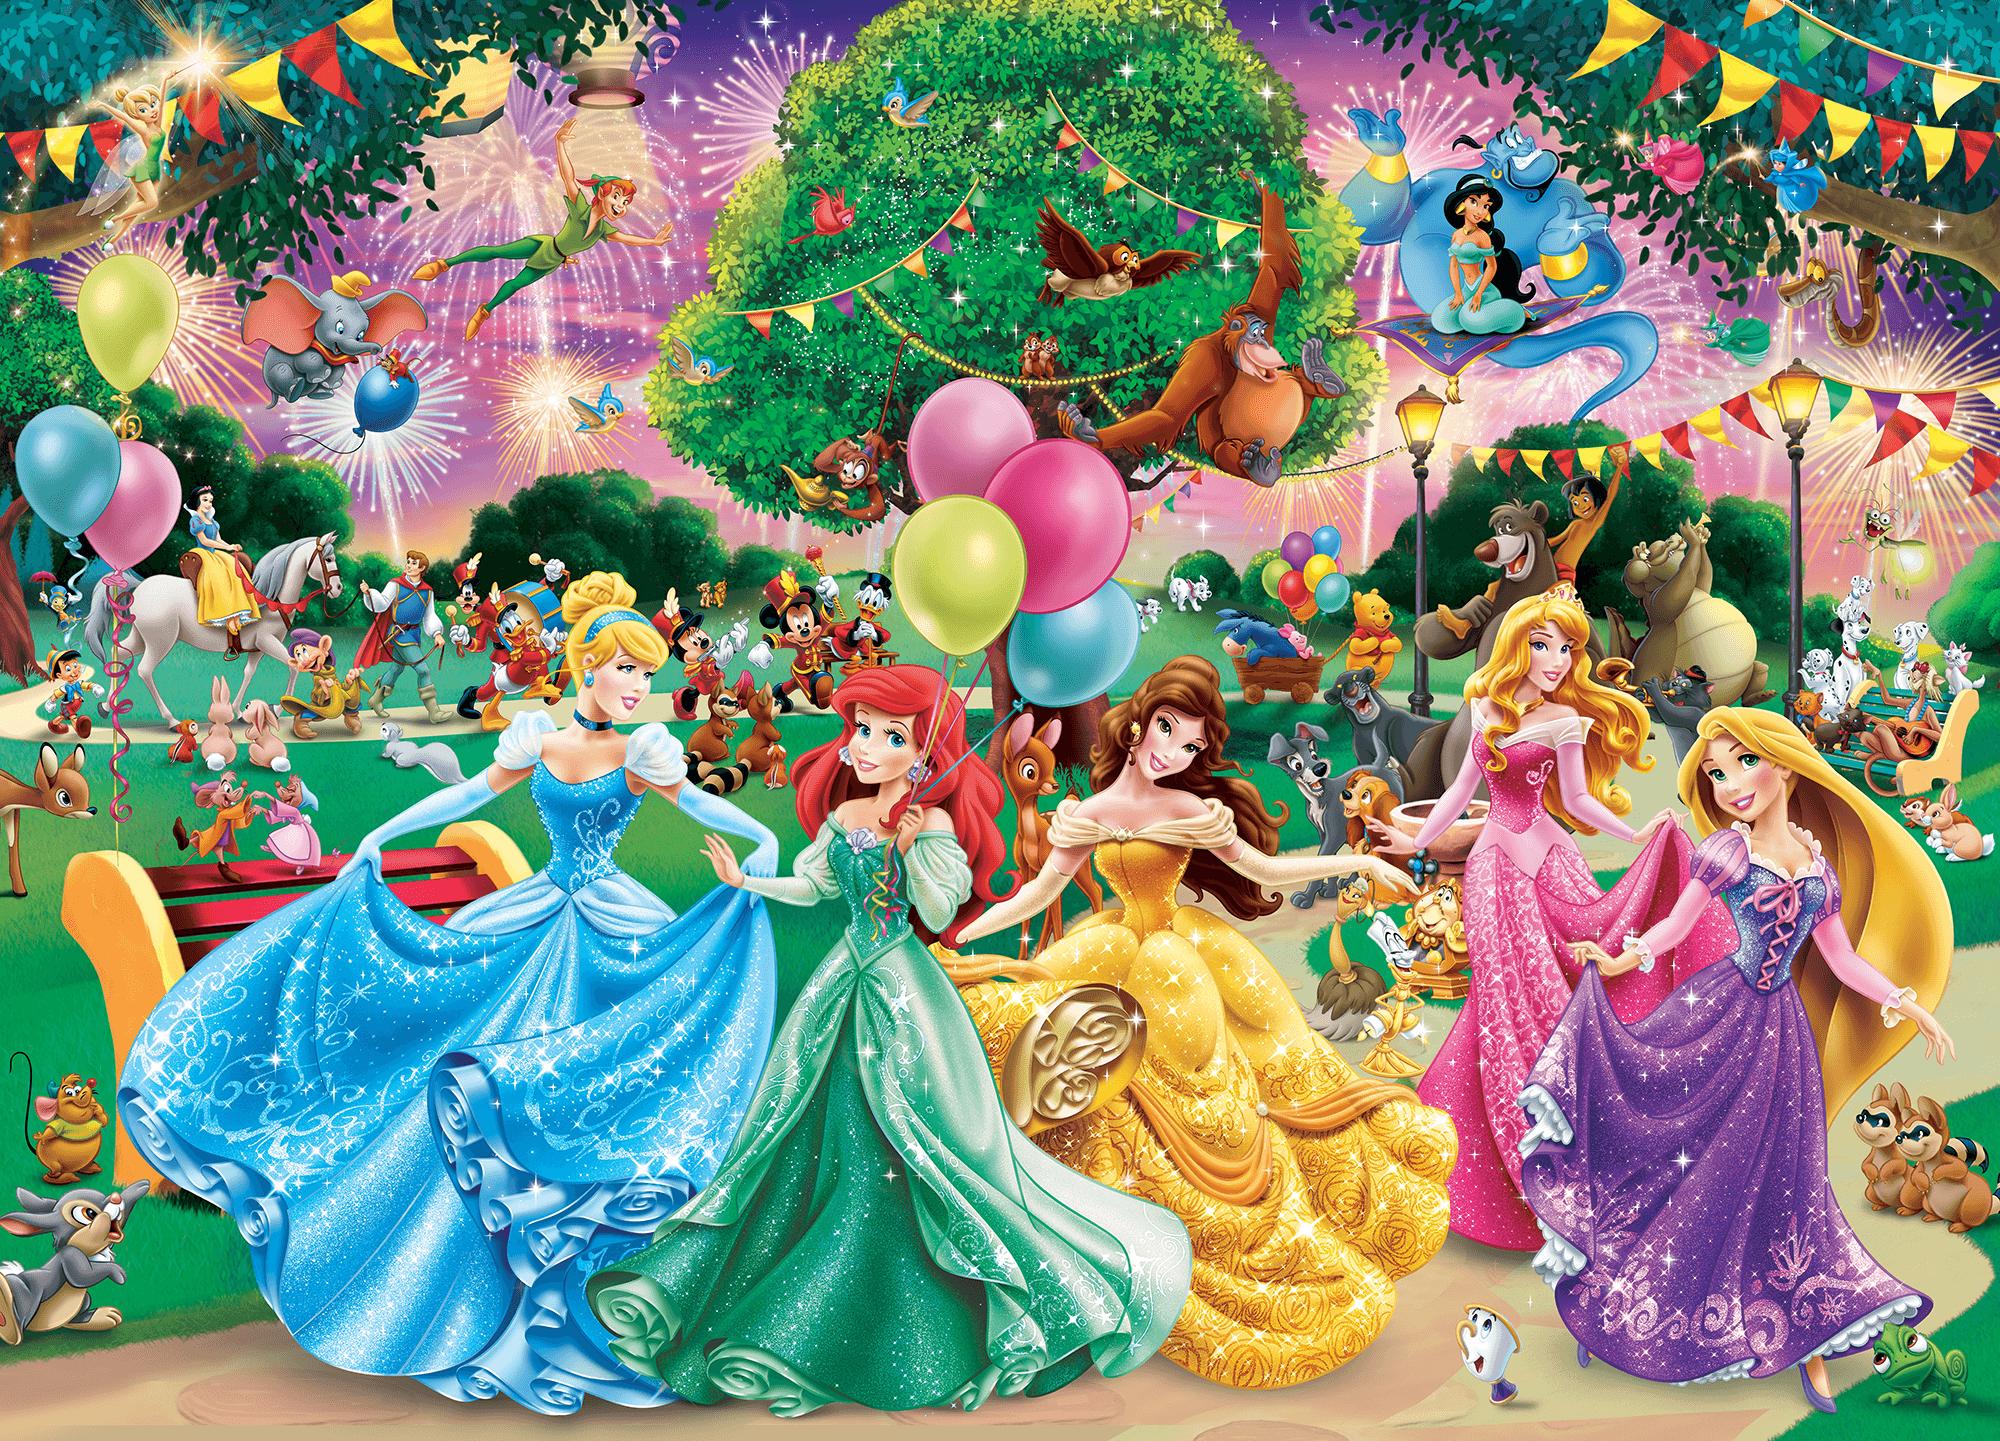 Stickers Cameretta Disney : Fotomurale principesse disney stickersmurali.com